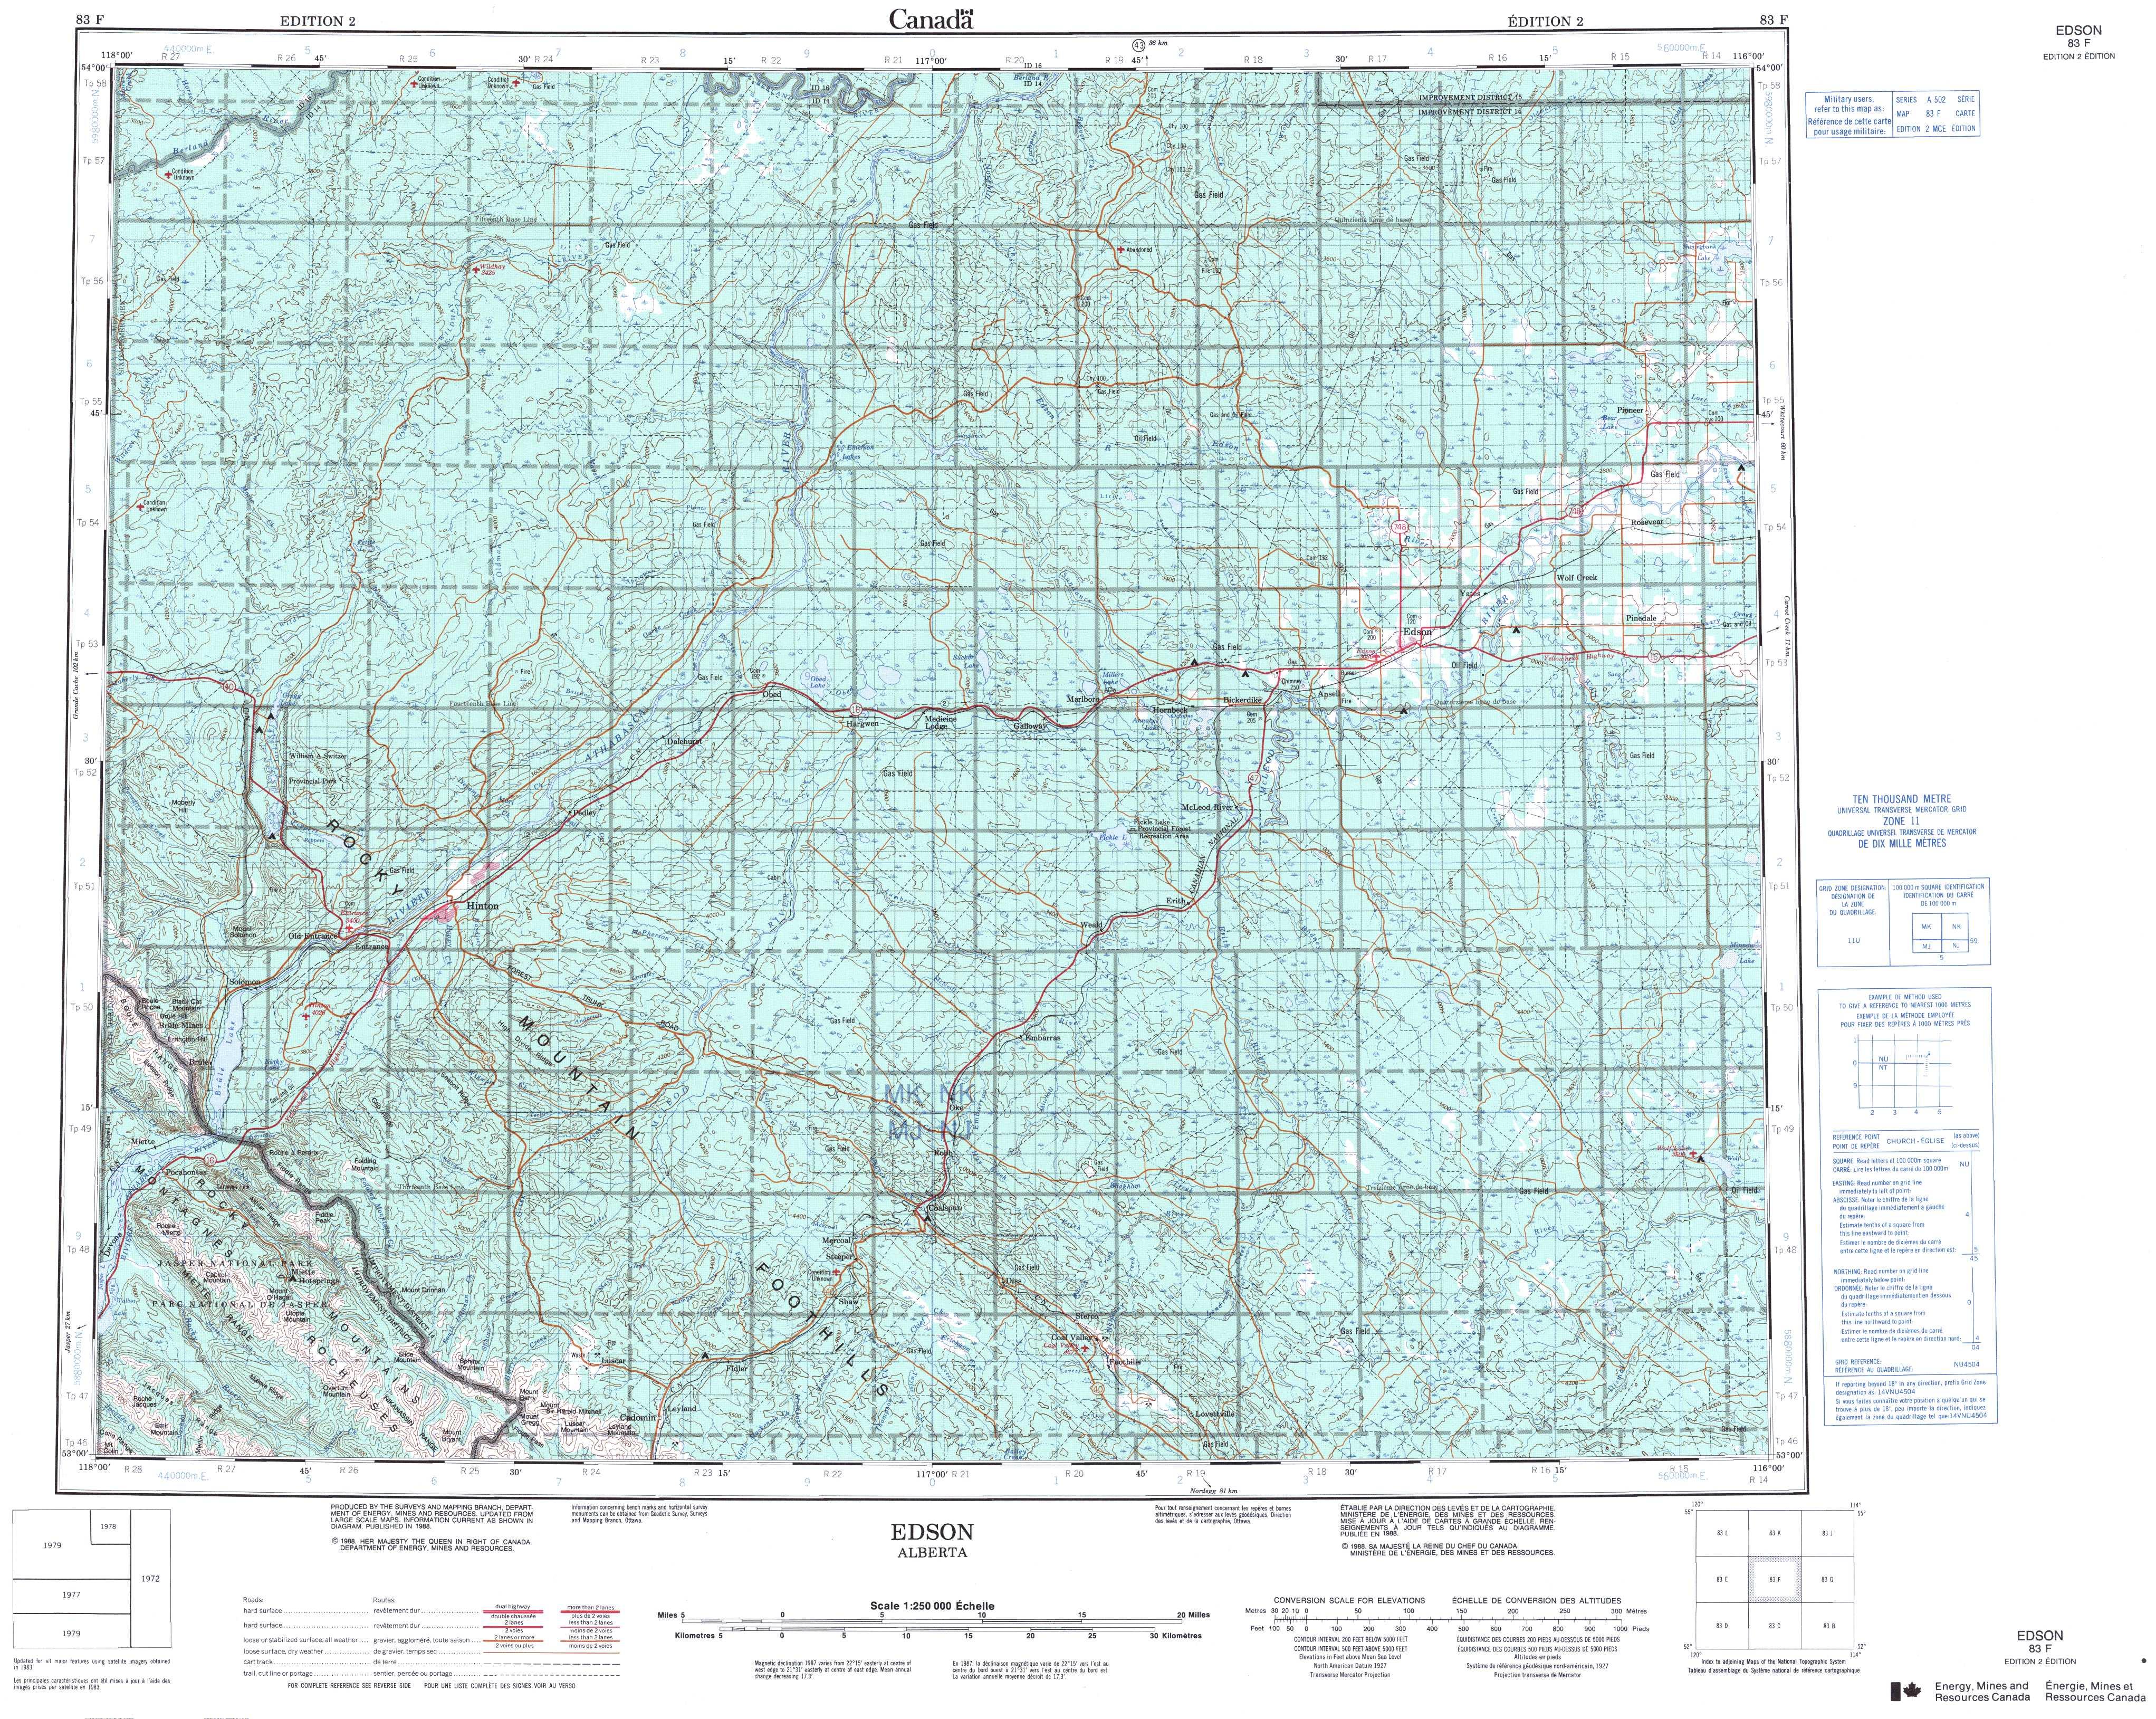 Printable Topographic Map Of Edson 083F, Ab - Free Printable Topo Maps